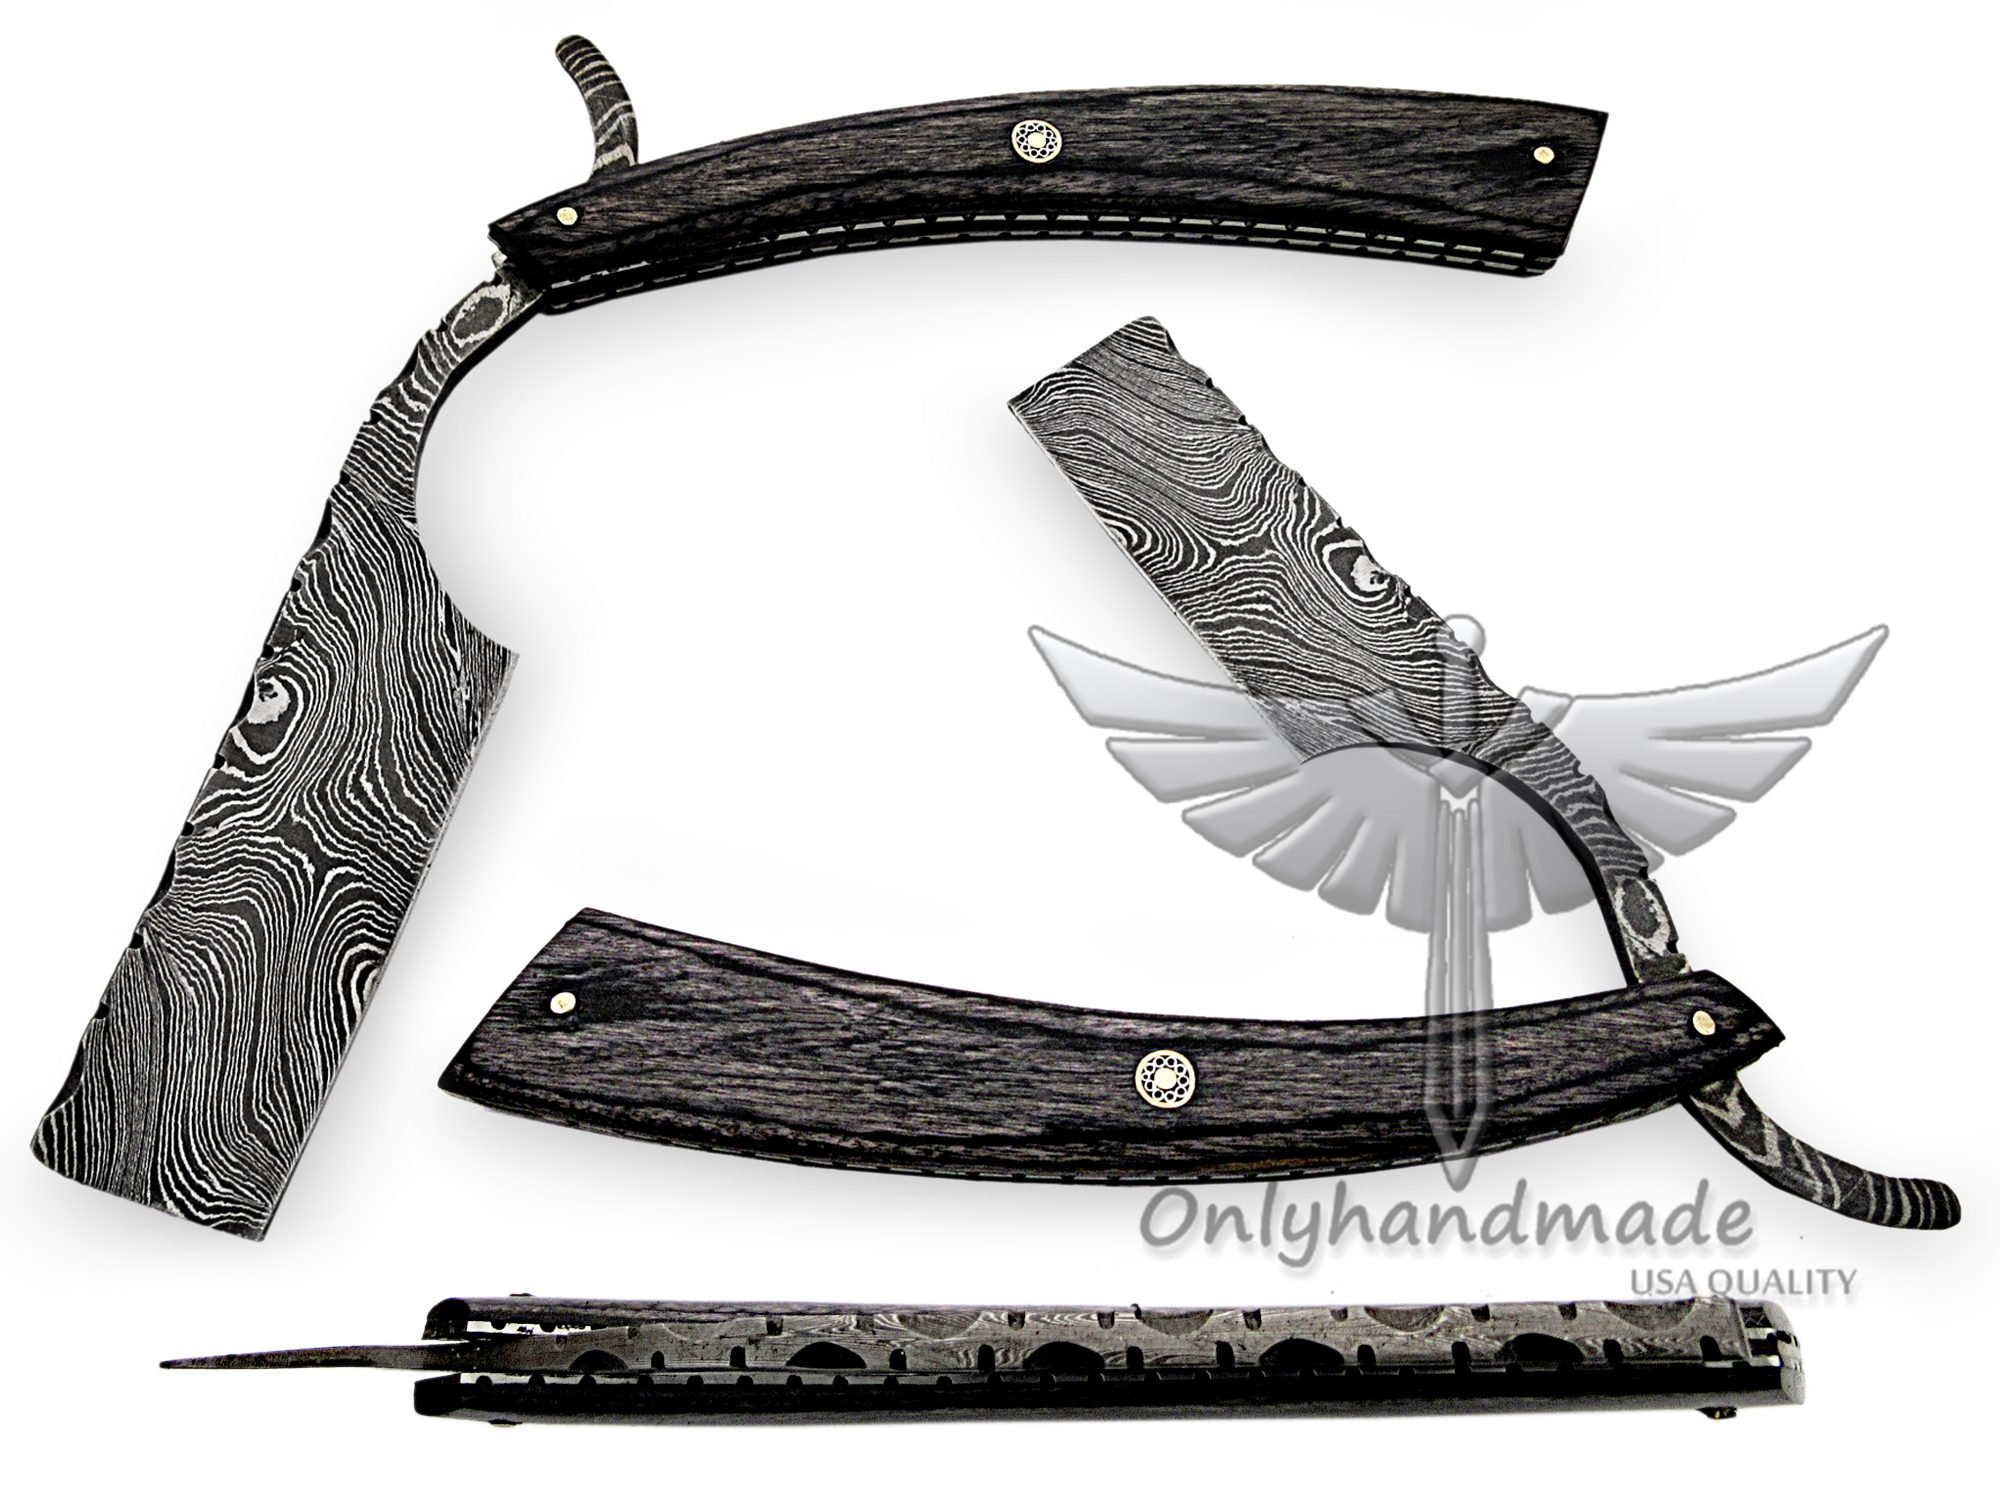 Black Wood/100% Handmade custom Damascus steel straight razor/shaving razor/special handle and leather sheath 05100